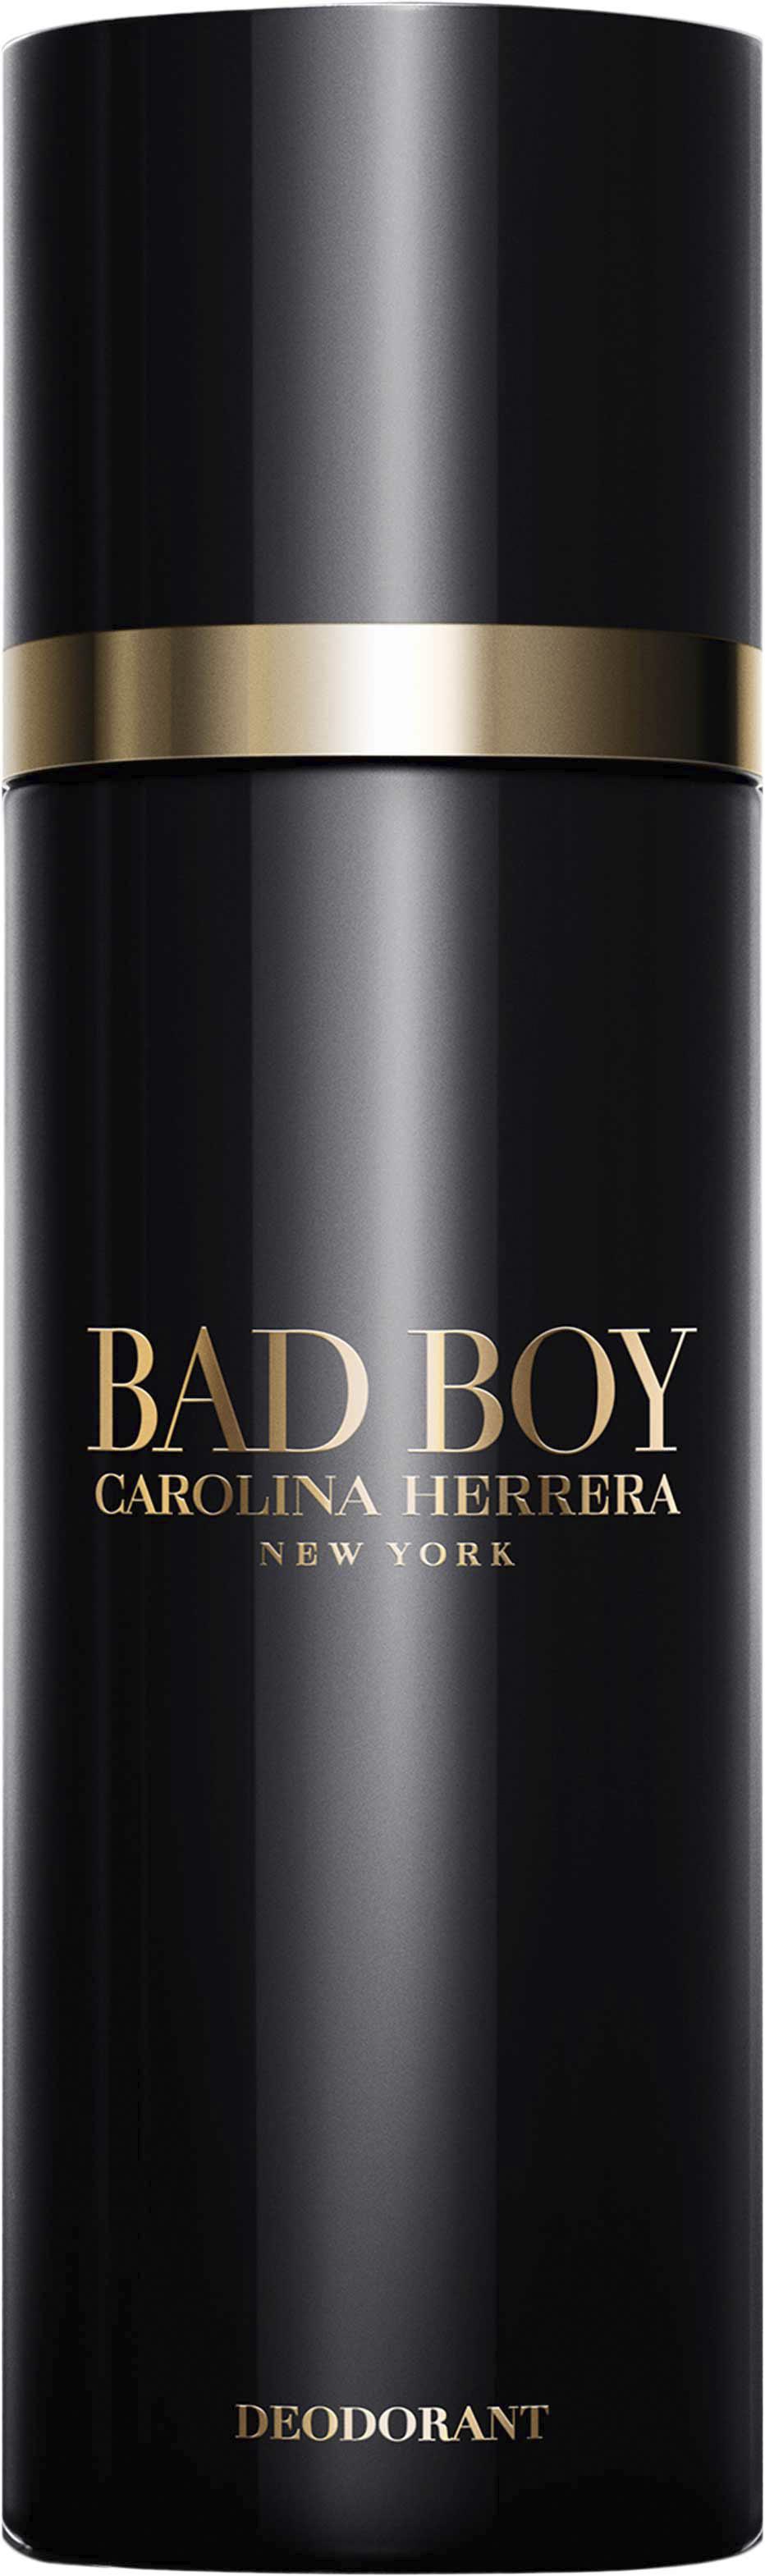 Carolina Herrera - Bad Boy Deodorant Spray 100 ml